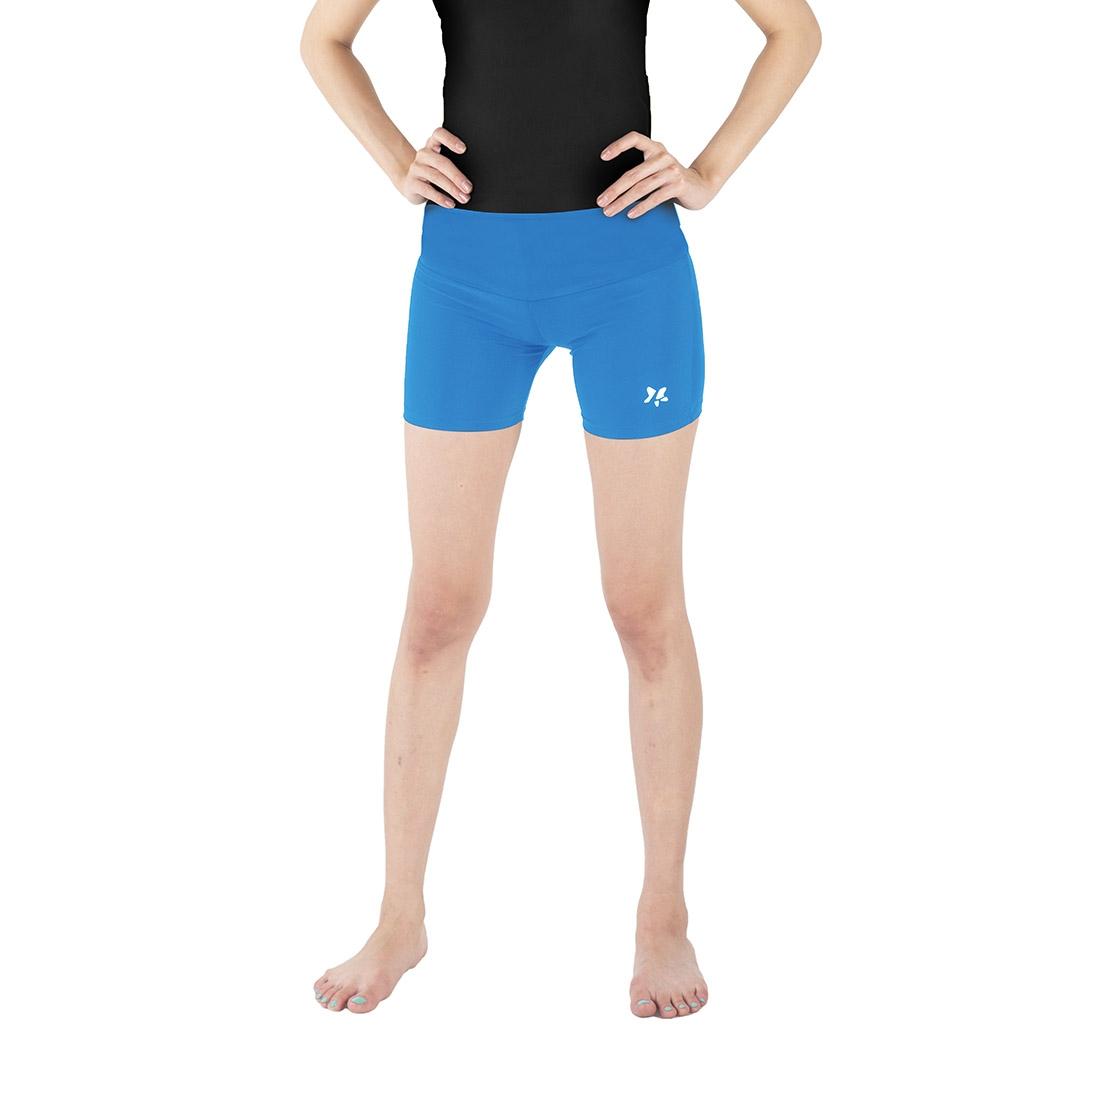 lasona women sportswear celana olahraga hotpant wanita hp